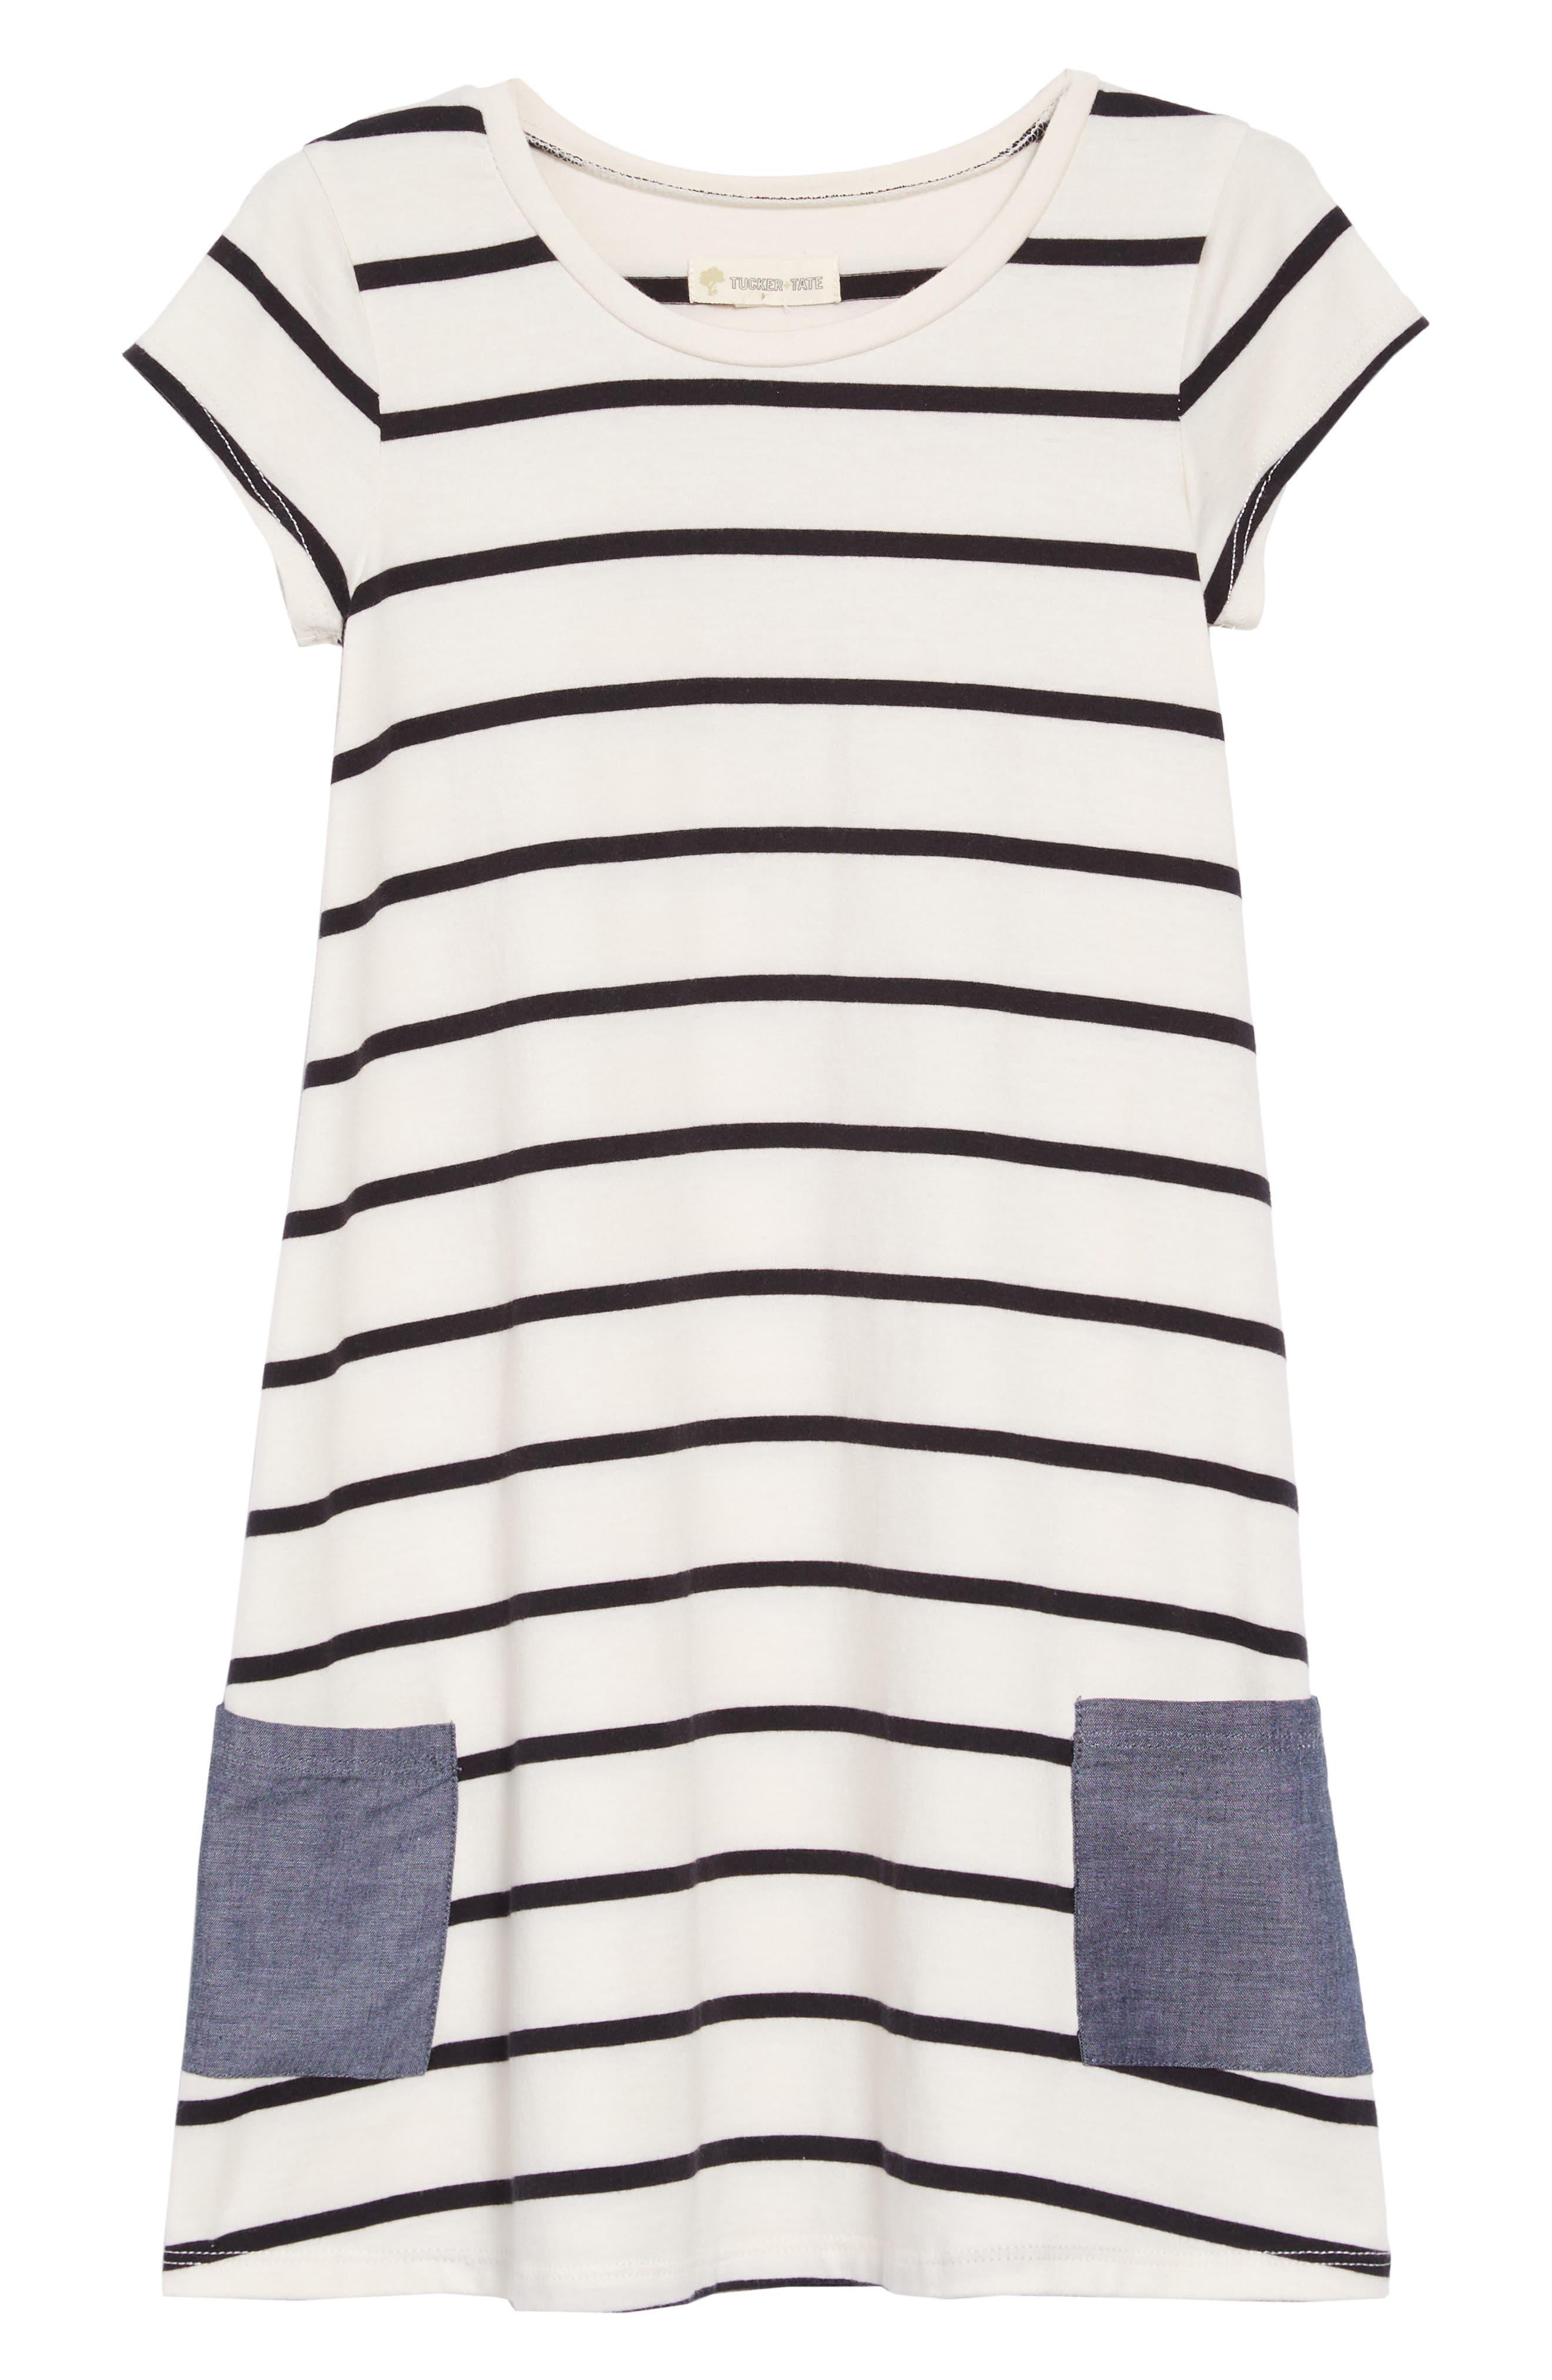 Contrast Pocket T-Shirt Dress,                         Main,                         color, 900